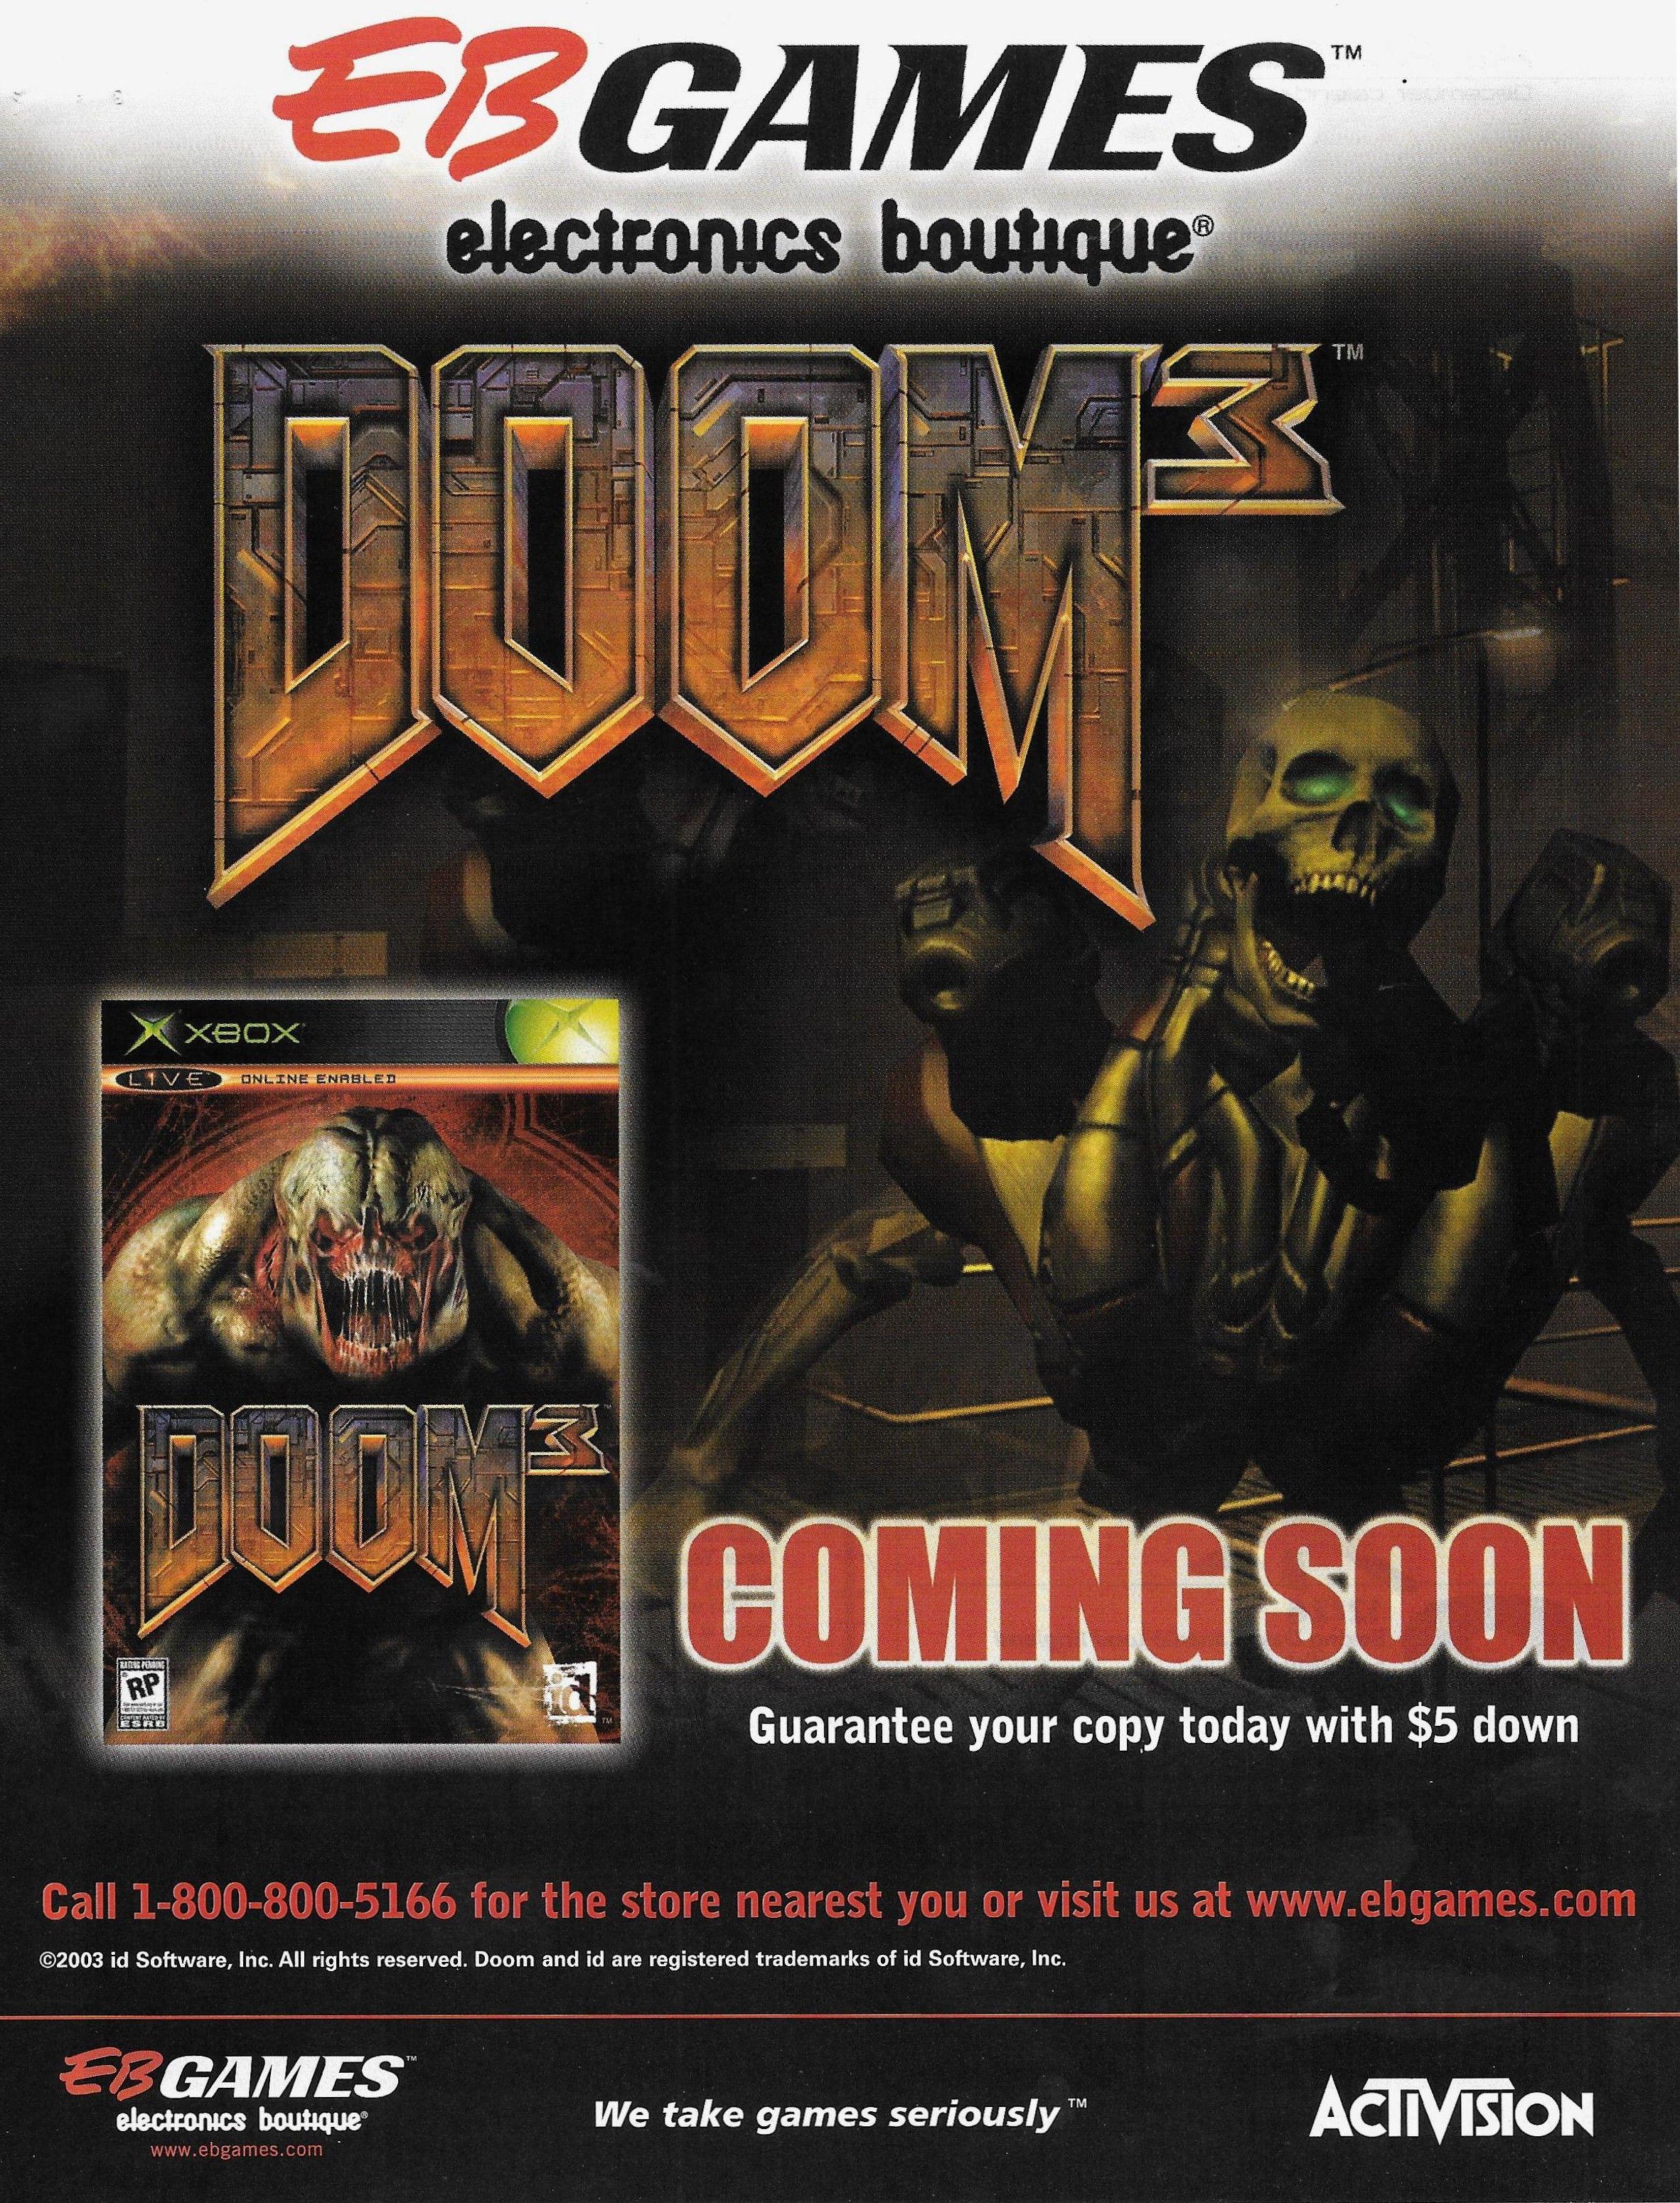 6ace94598a6c2264537d106398550a73 - How To Get Doom 3 To Work On Windows 10